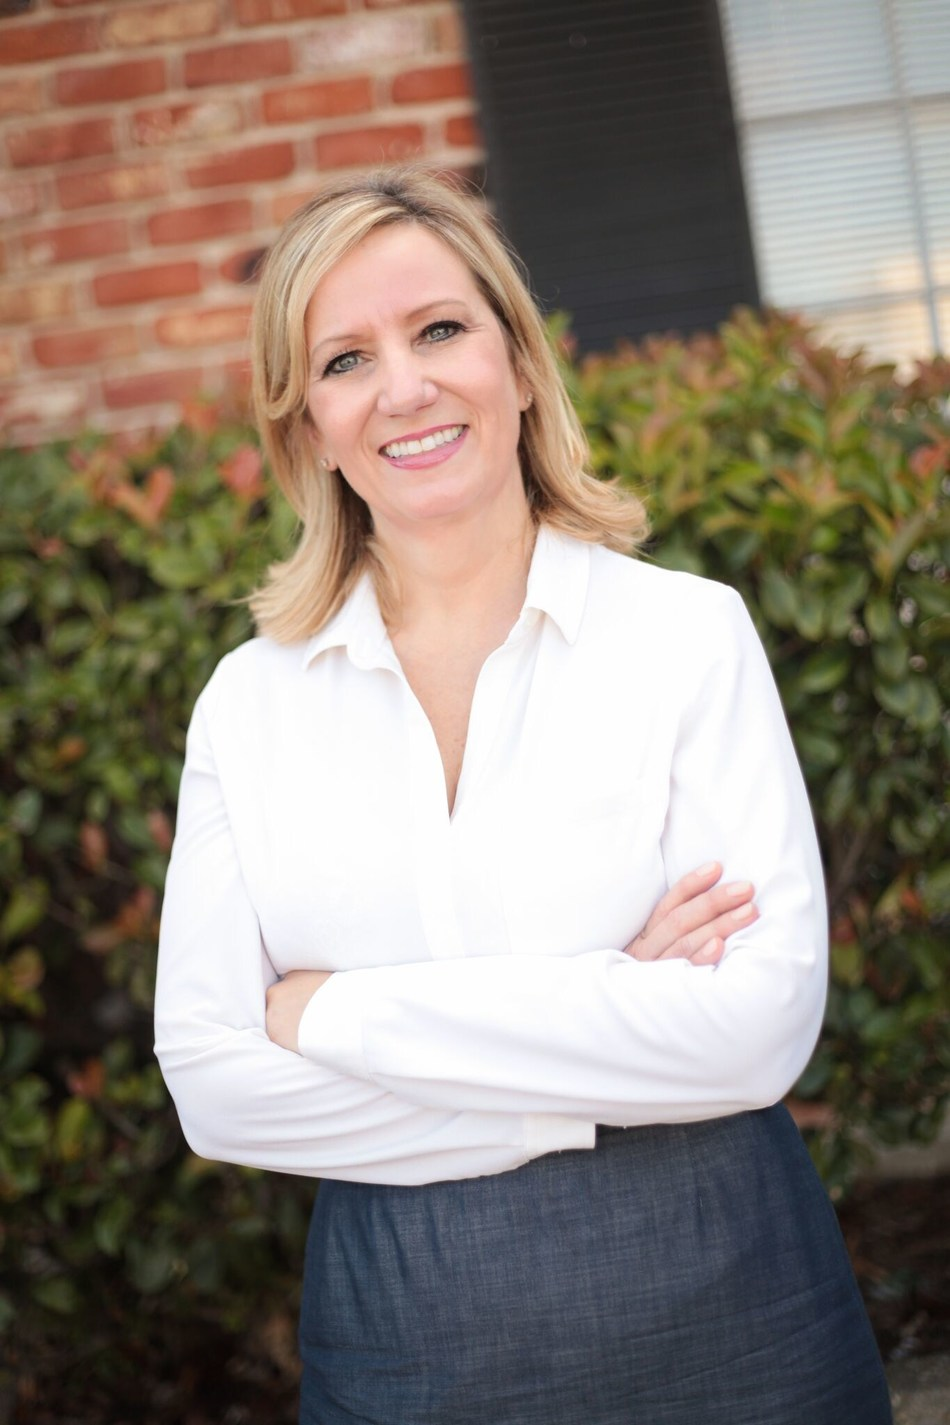 Dianne Denison named to NSBA Leadership Council